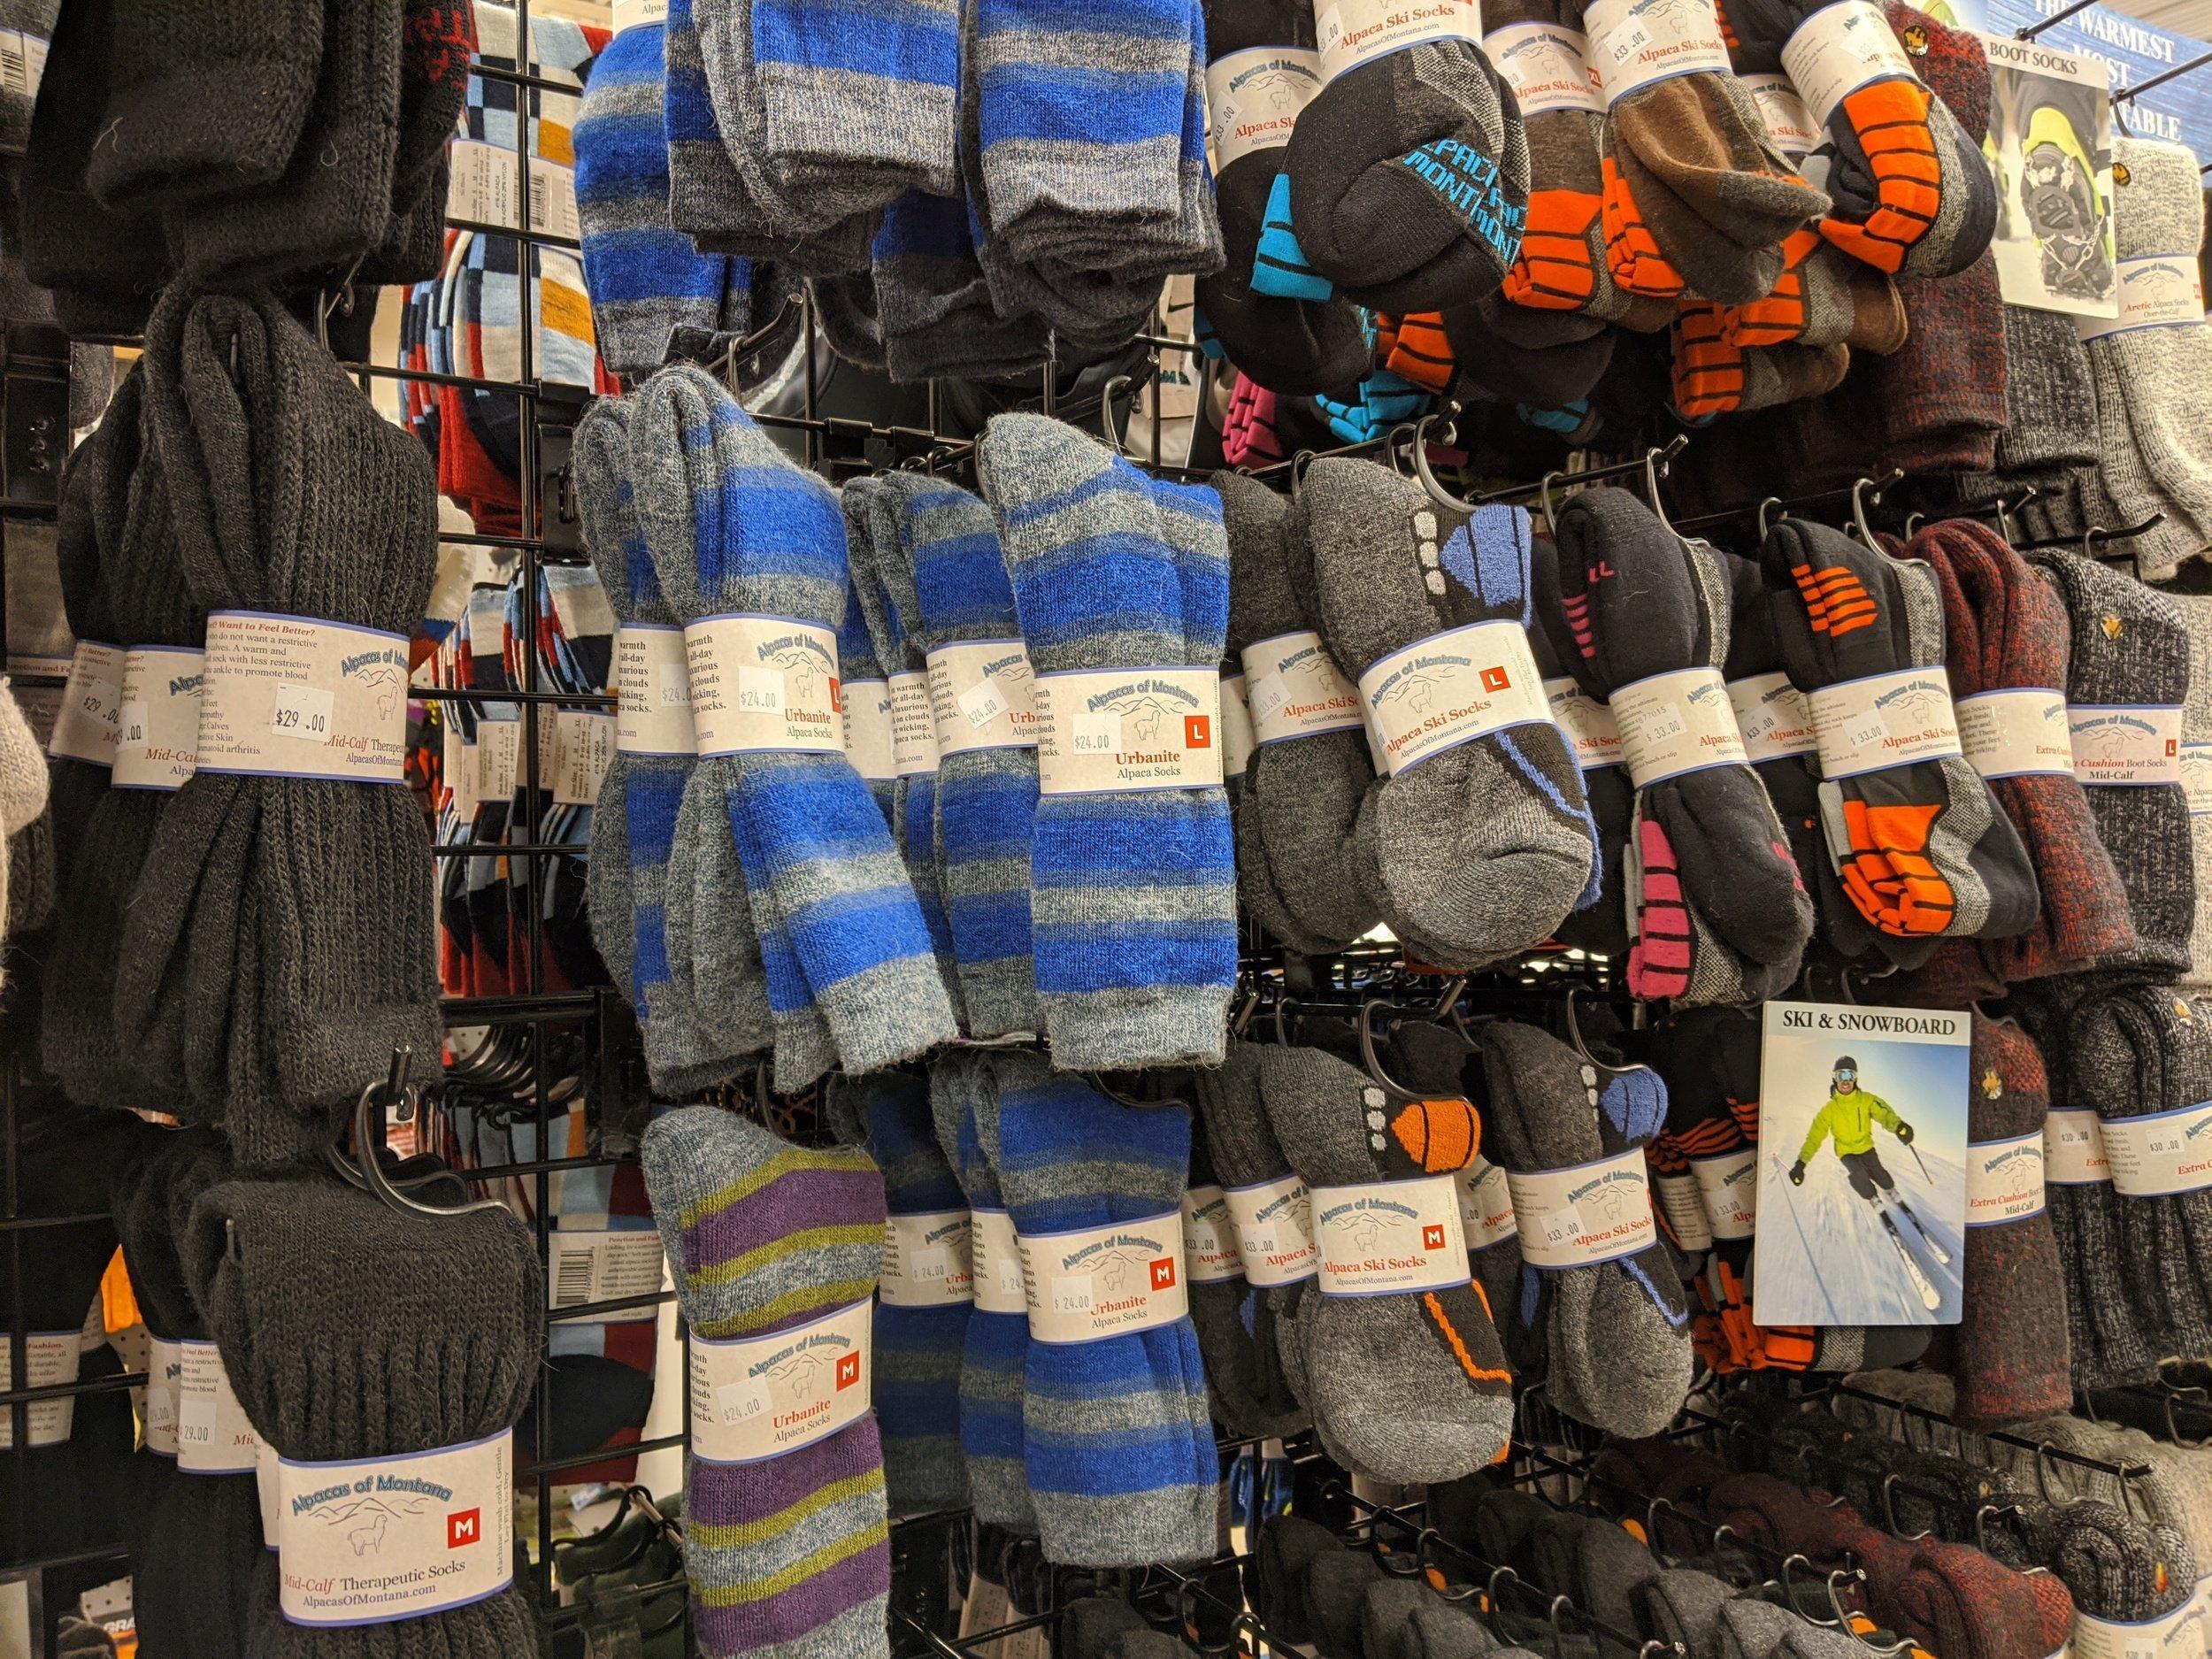 owenhouse ace hardware alpaca wool socks